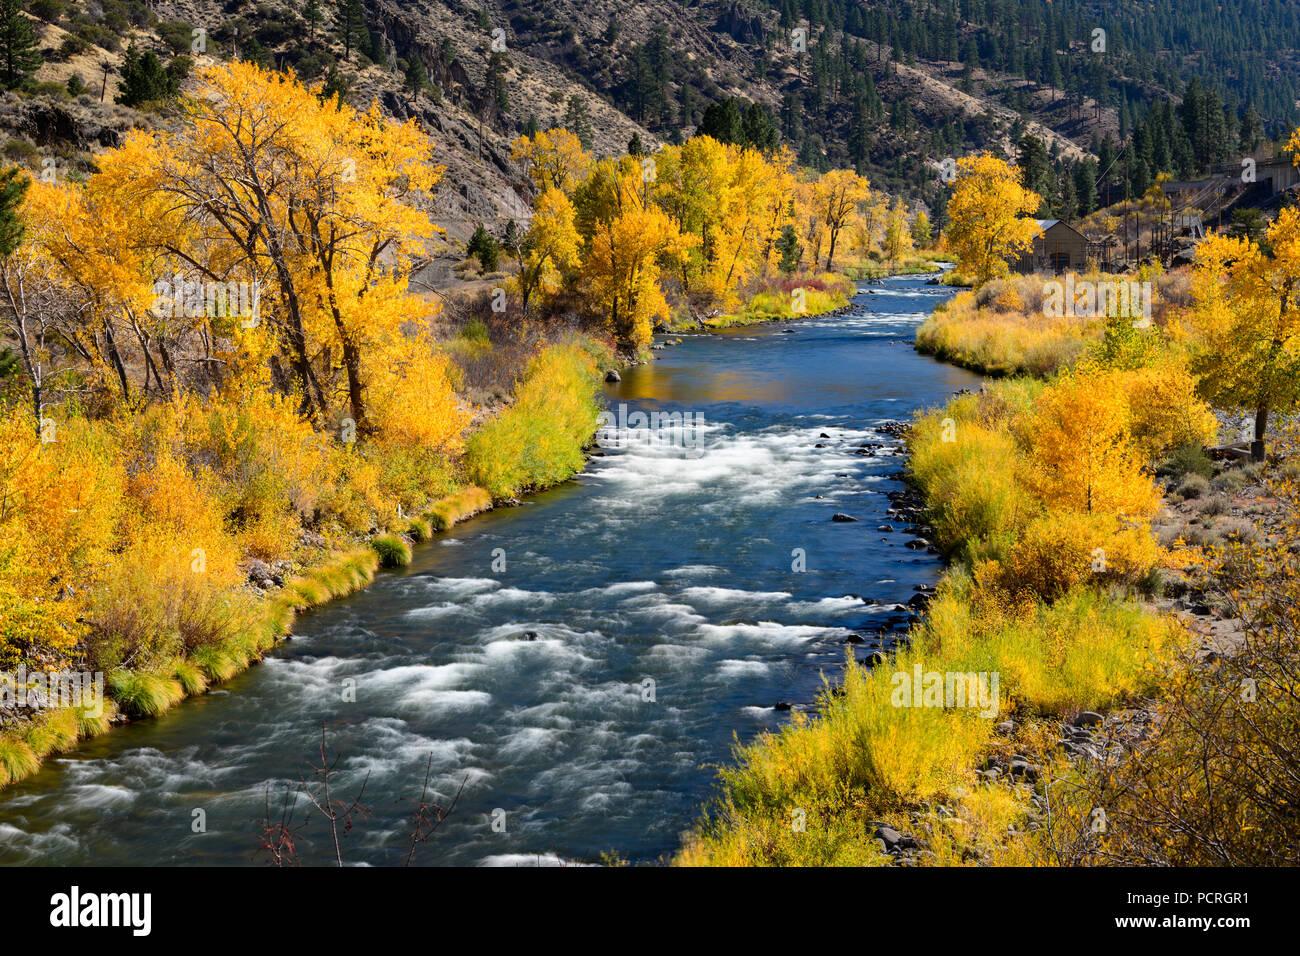 Fall color along the Truckee River near Reno, Nevada 2018. - Stock Image